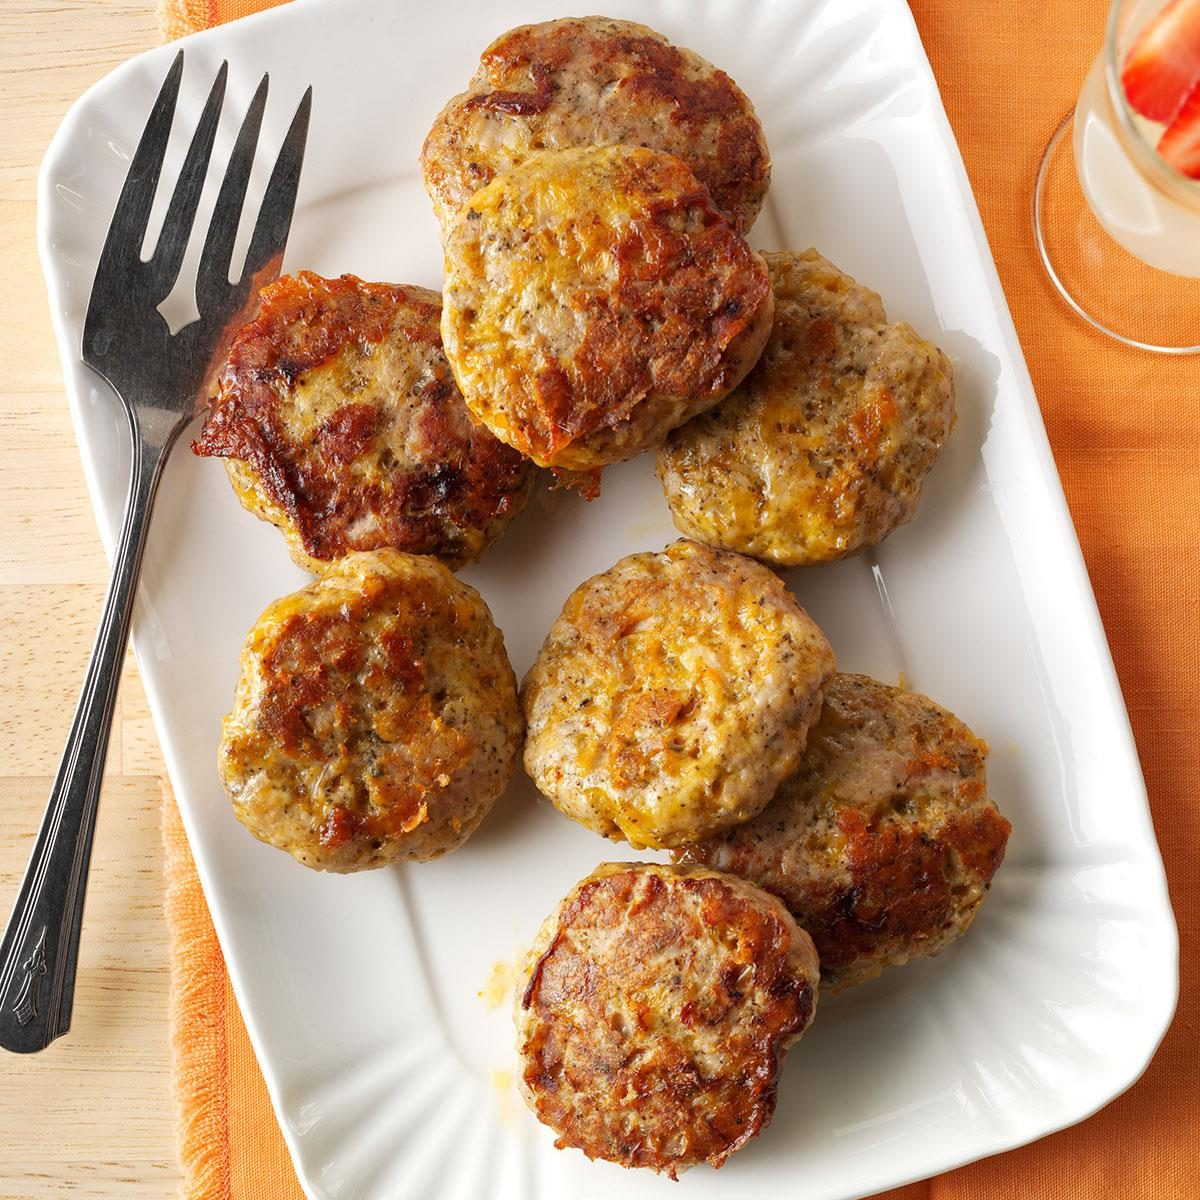 Homemade Sage Sausage Patties Recipe: How to Make It   Taste of Home